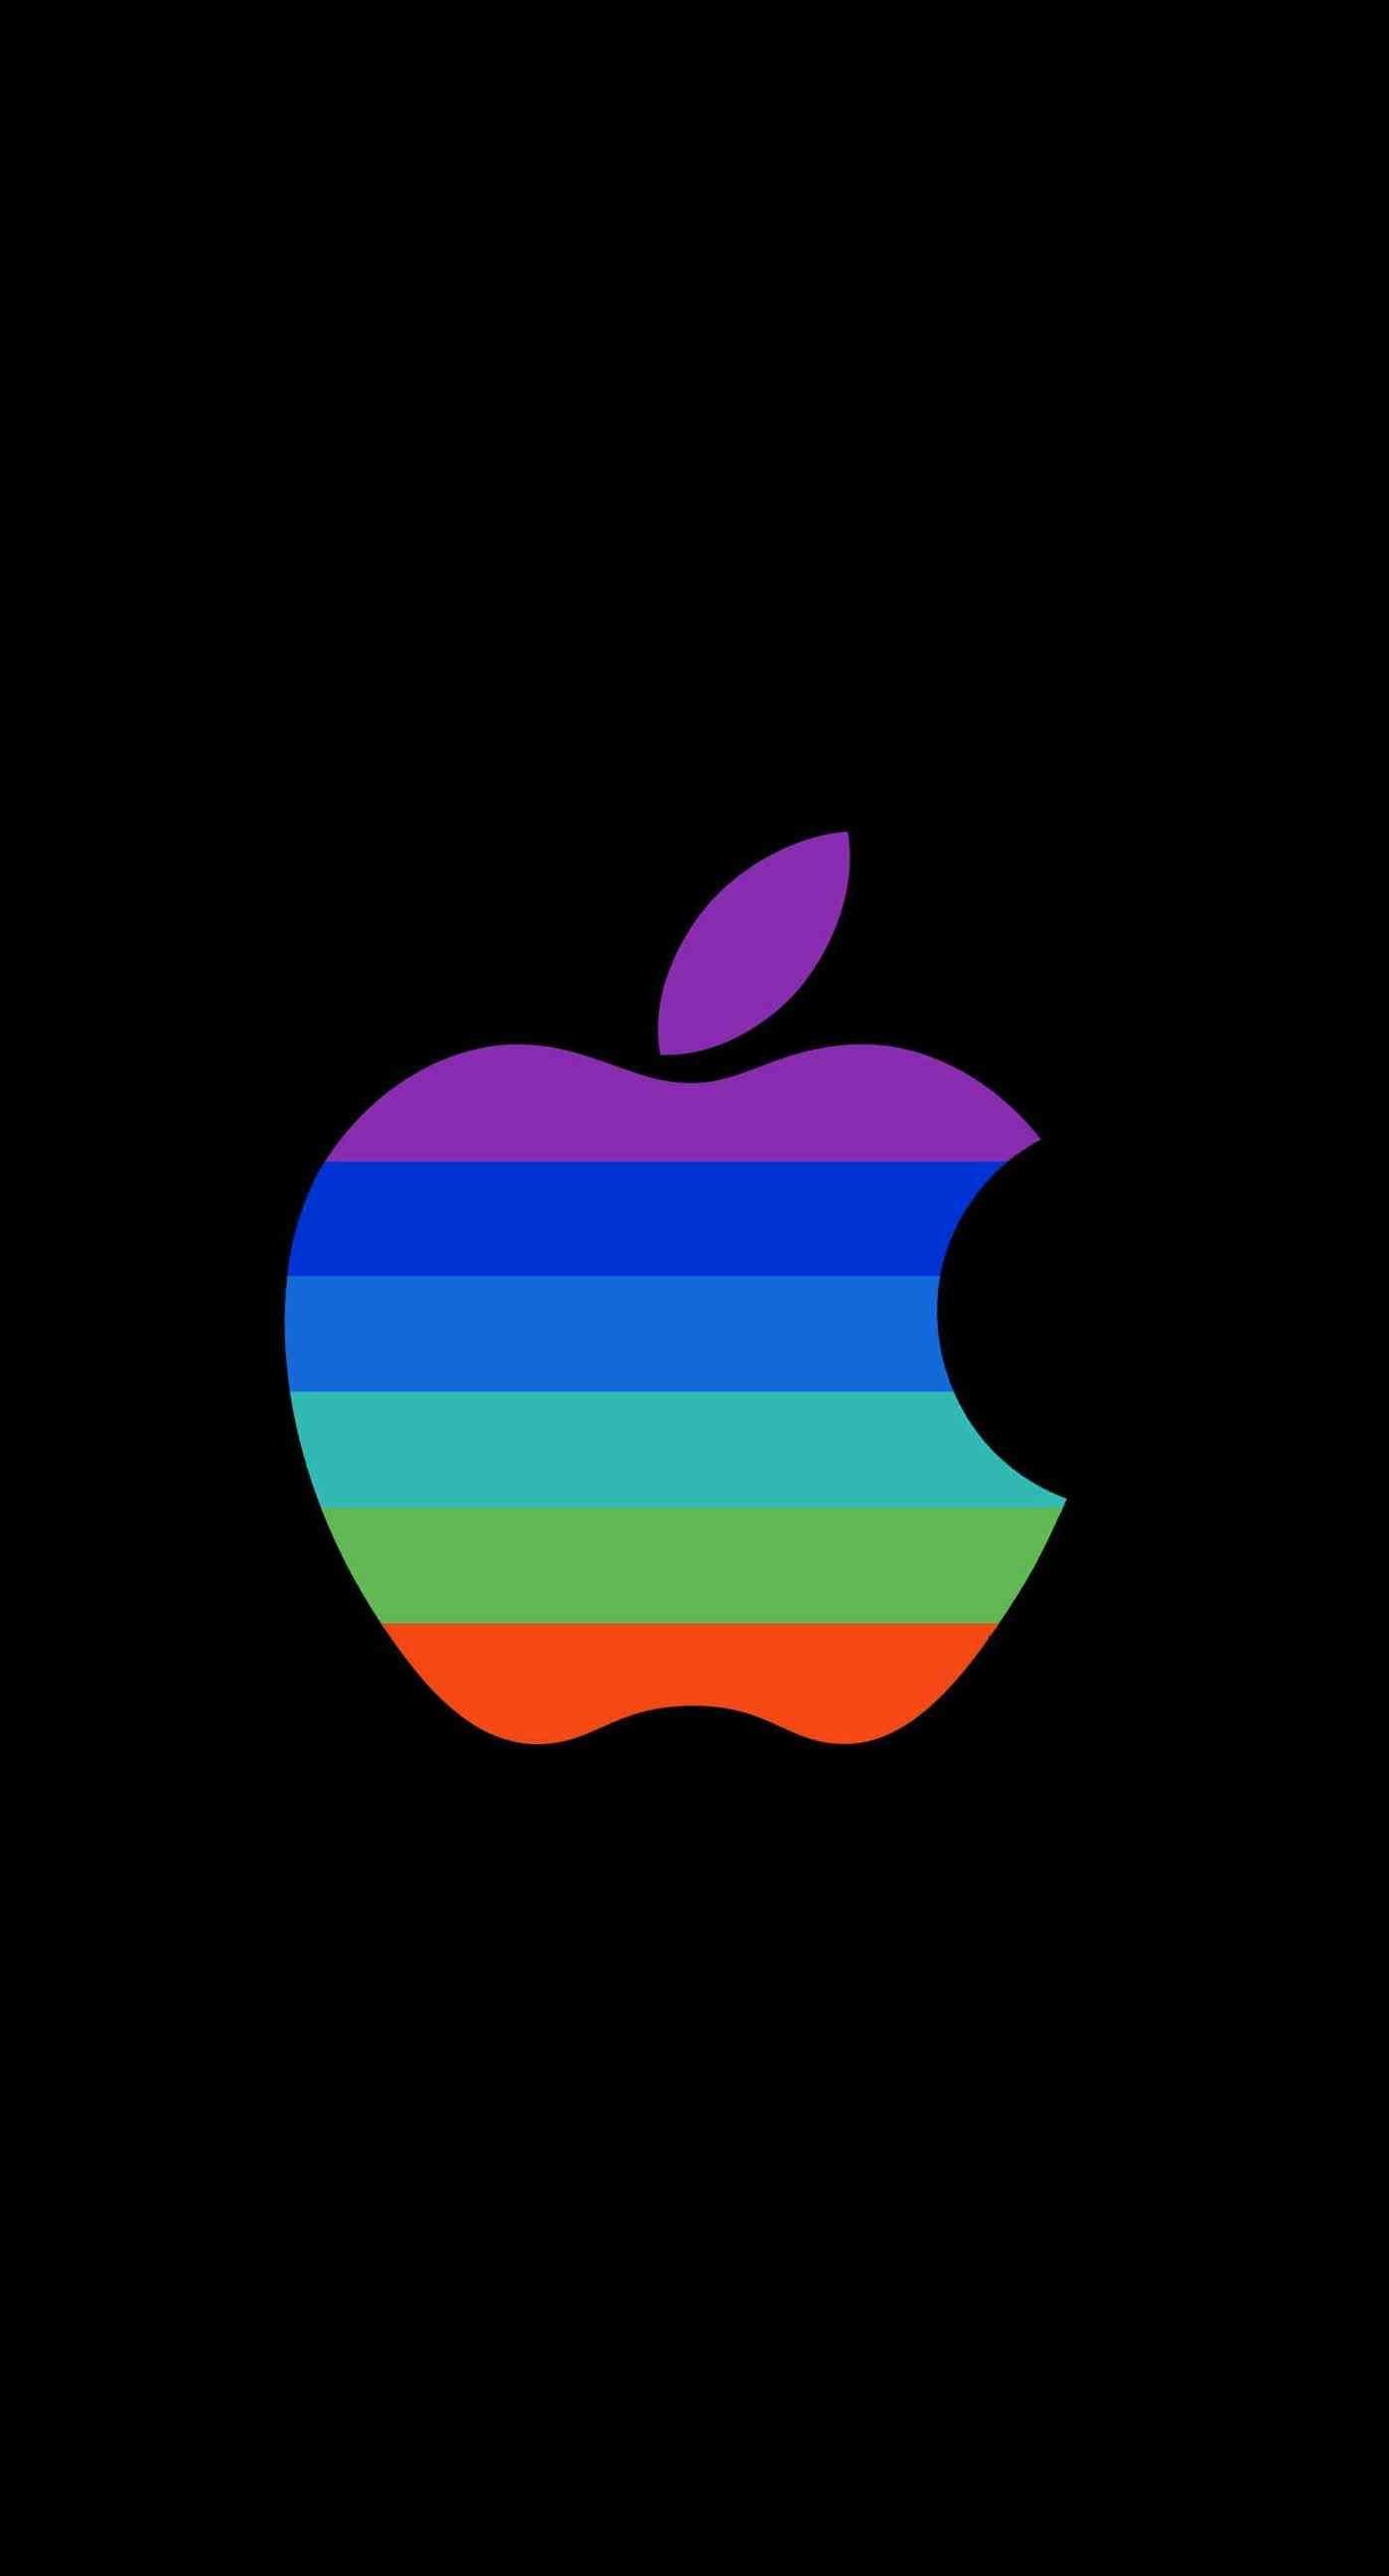 Cool Apple Logo Wallpaper Wallpapertag